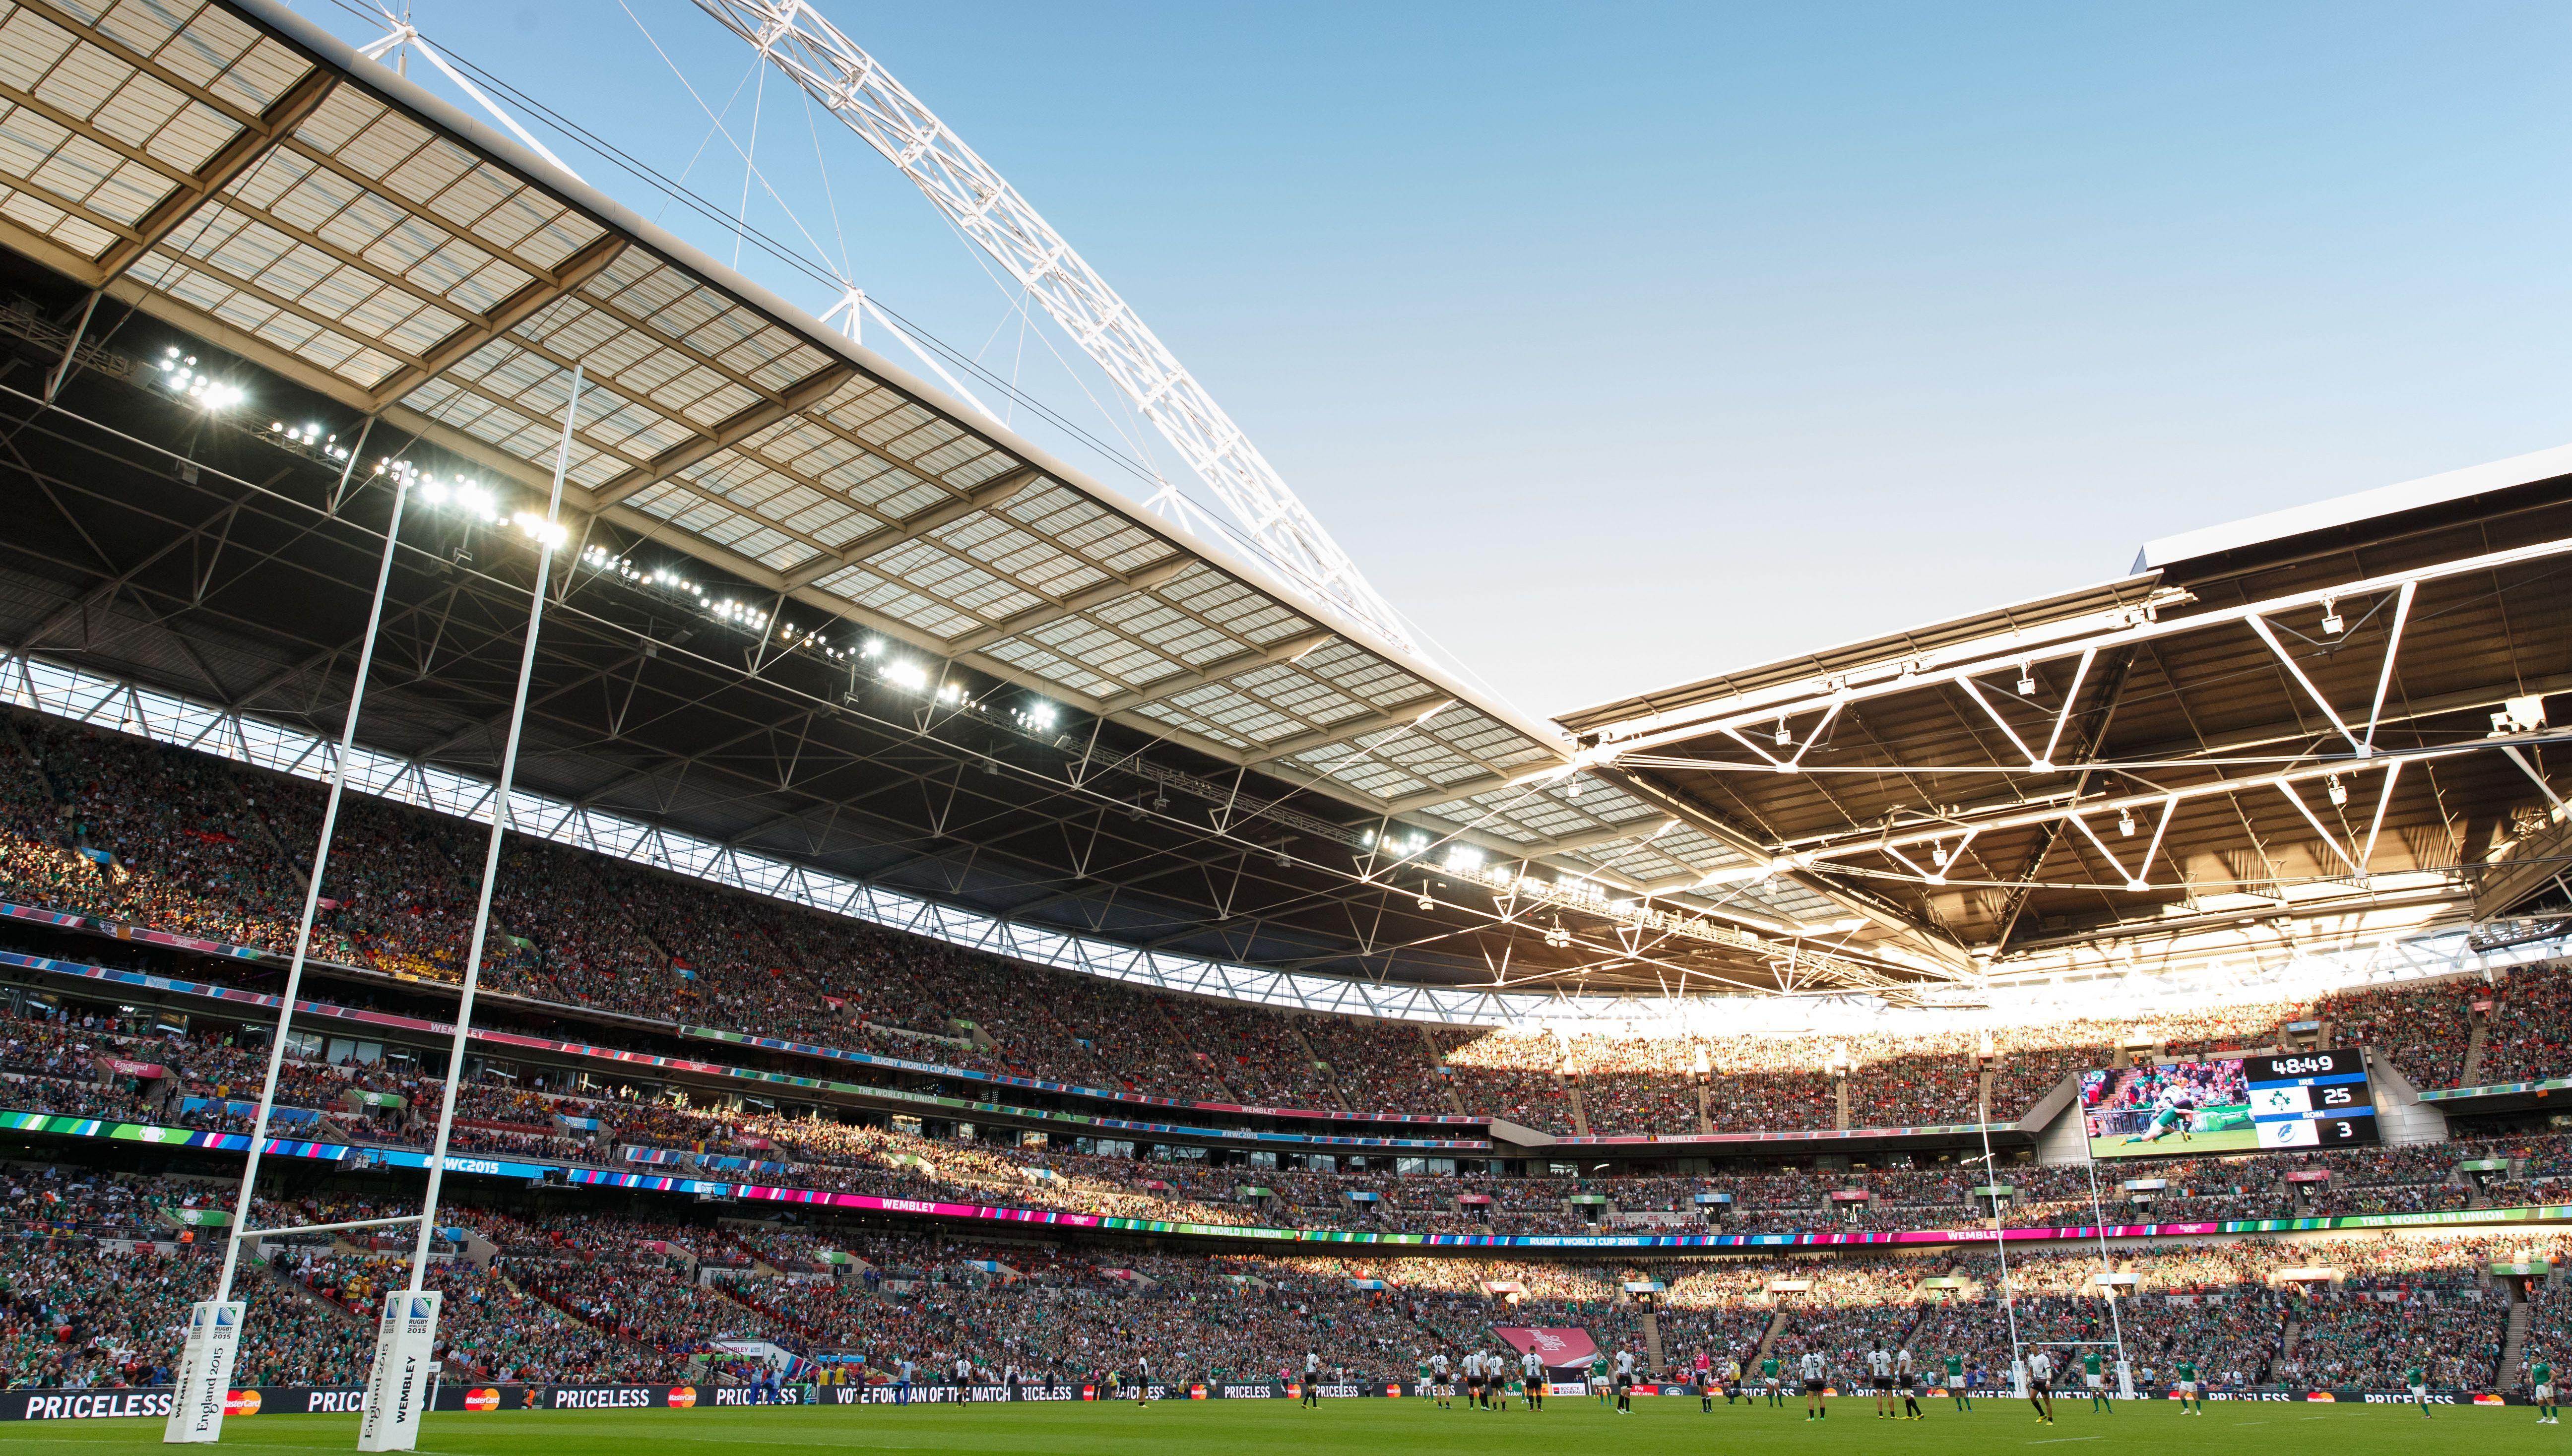 Football - Etranger - Un milliardaire américain veut racheter le stade de Wembley